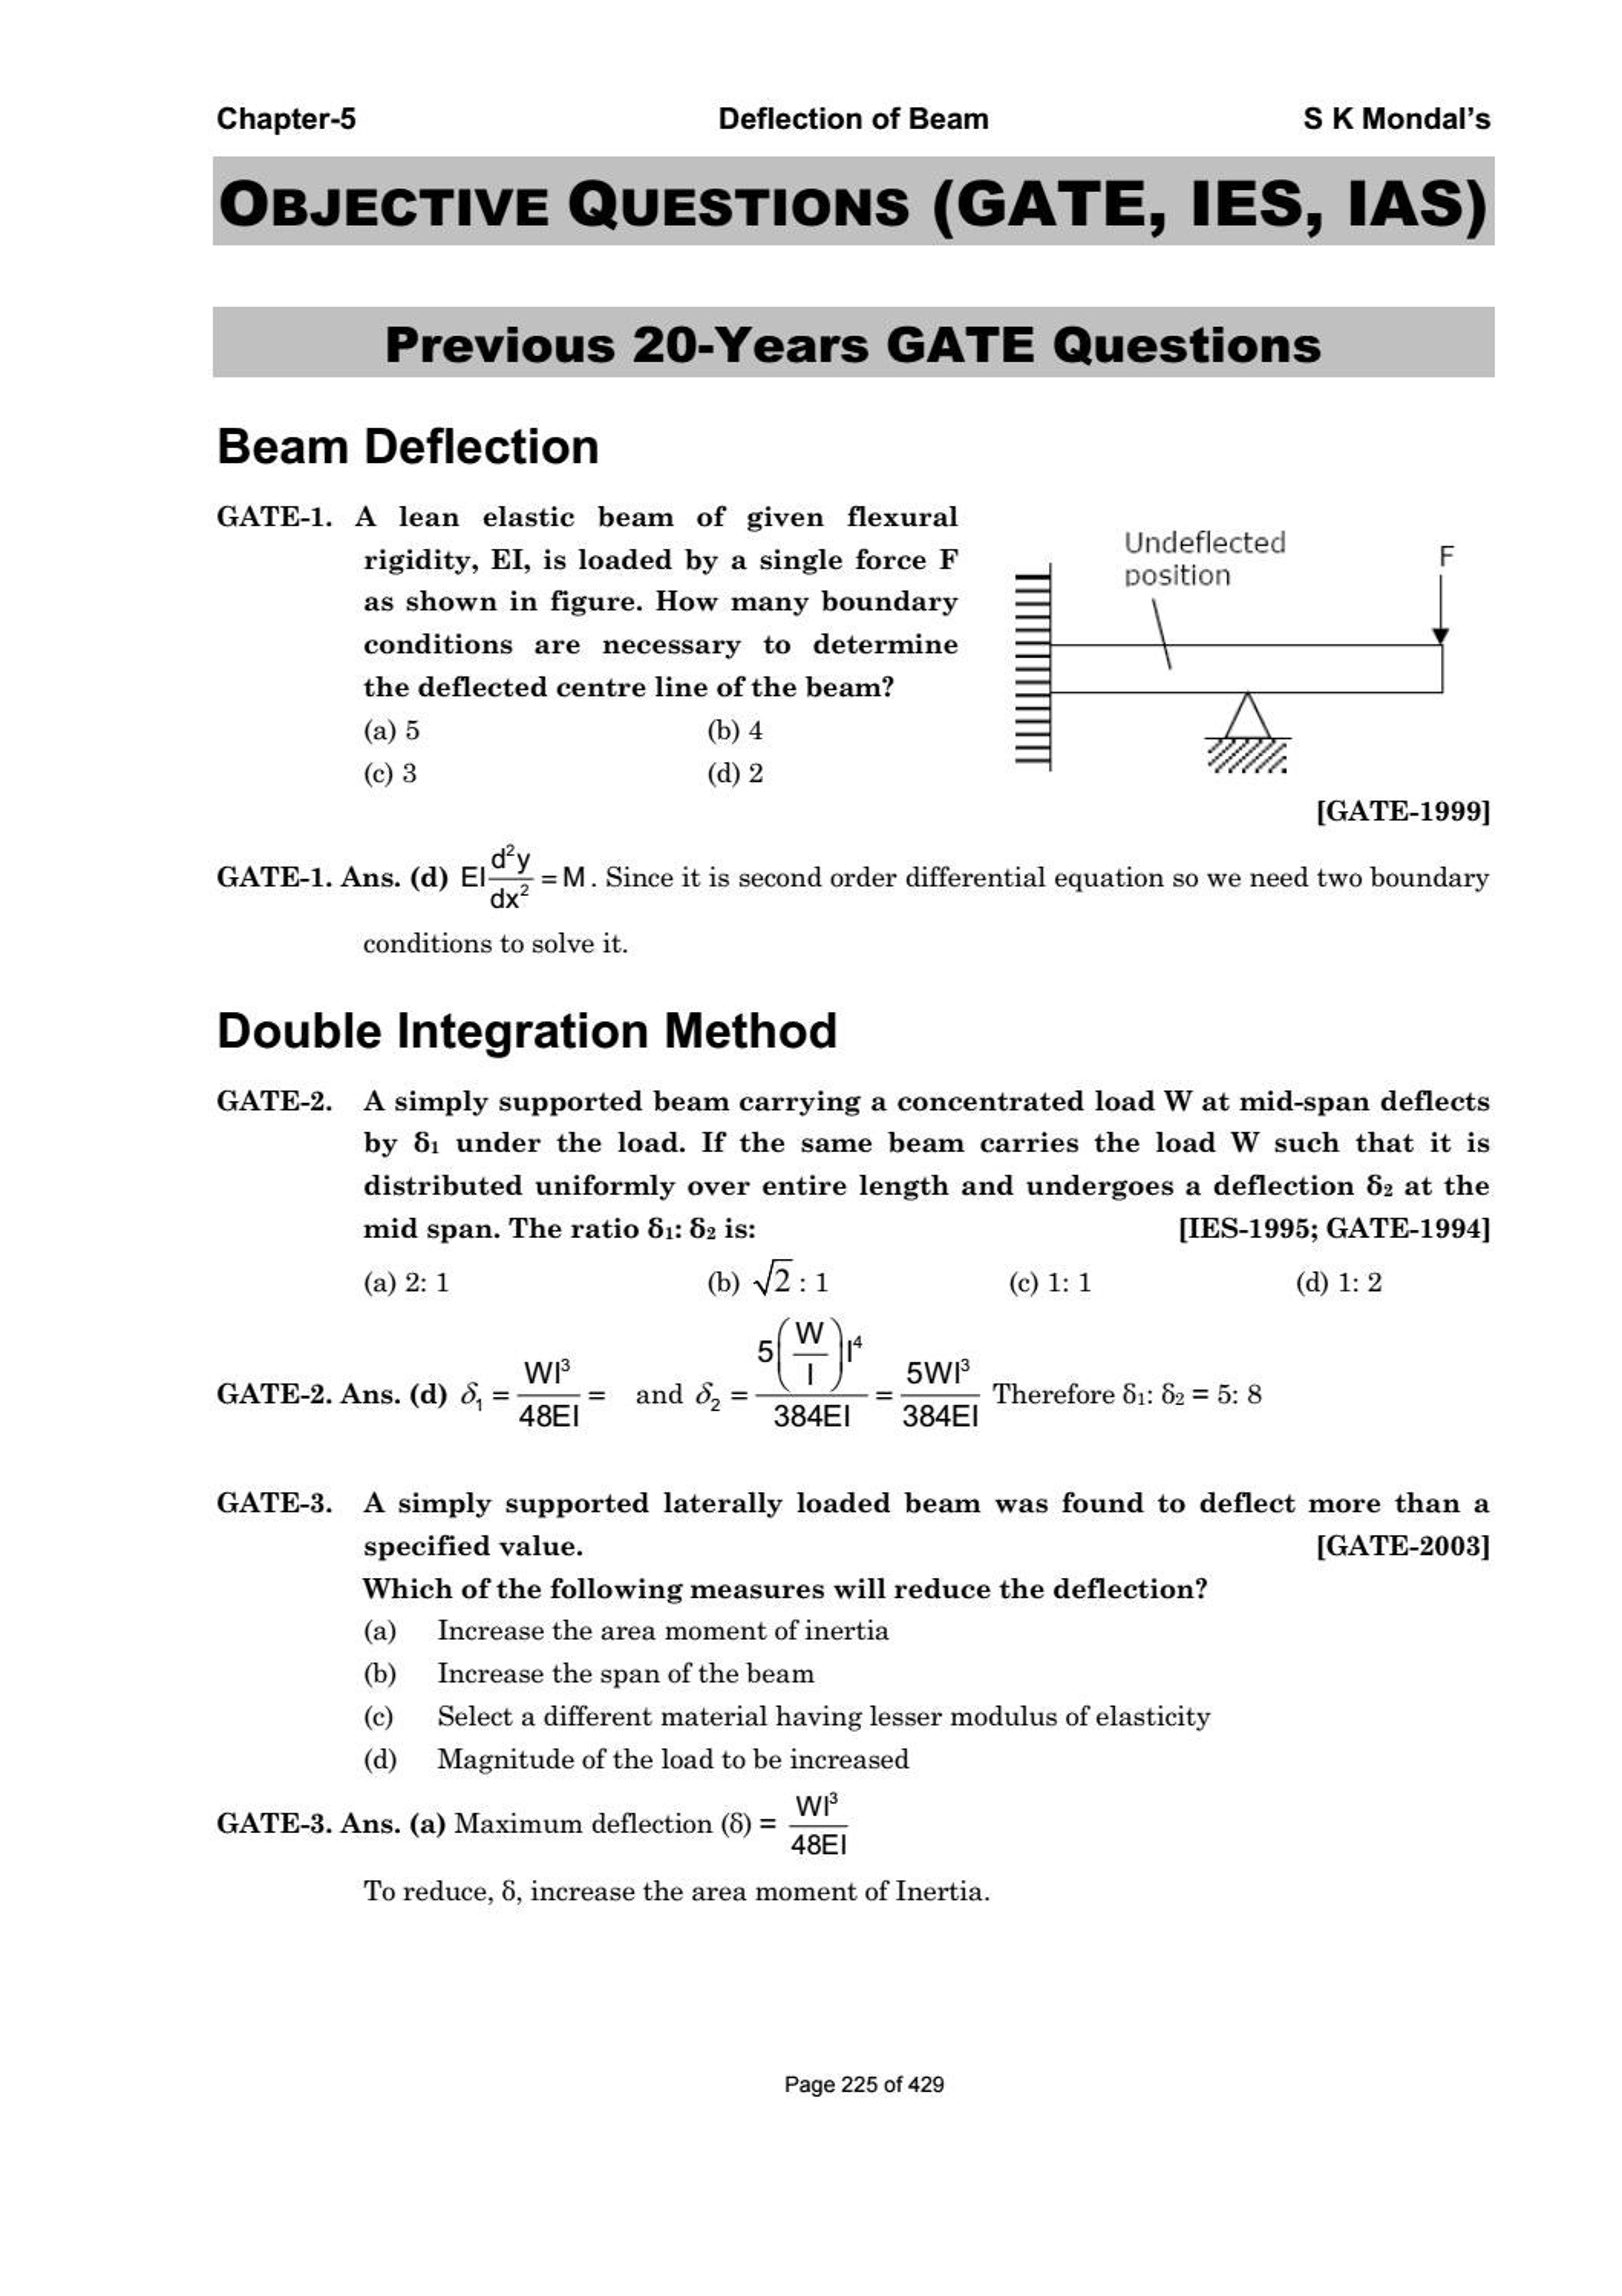 Strength of materials by s k mondal pdf by S Dharmaraj - issuu